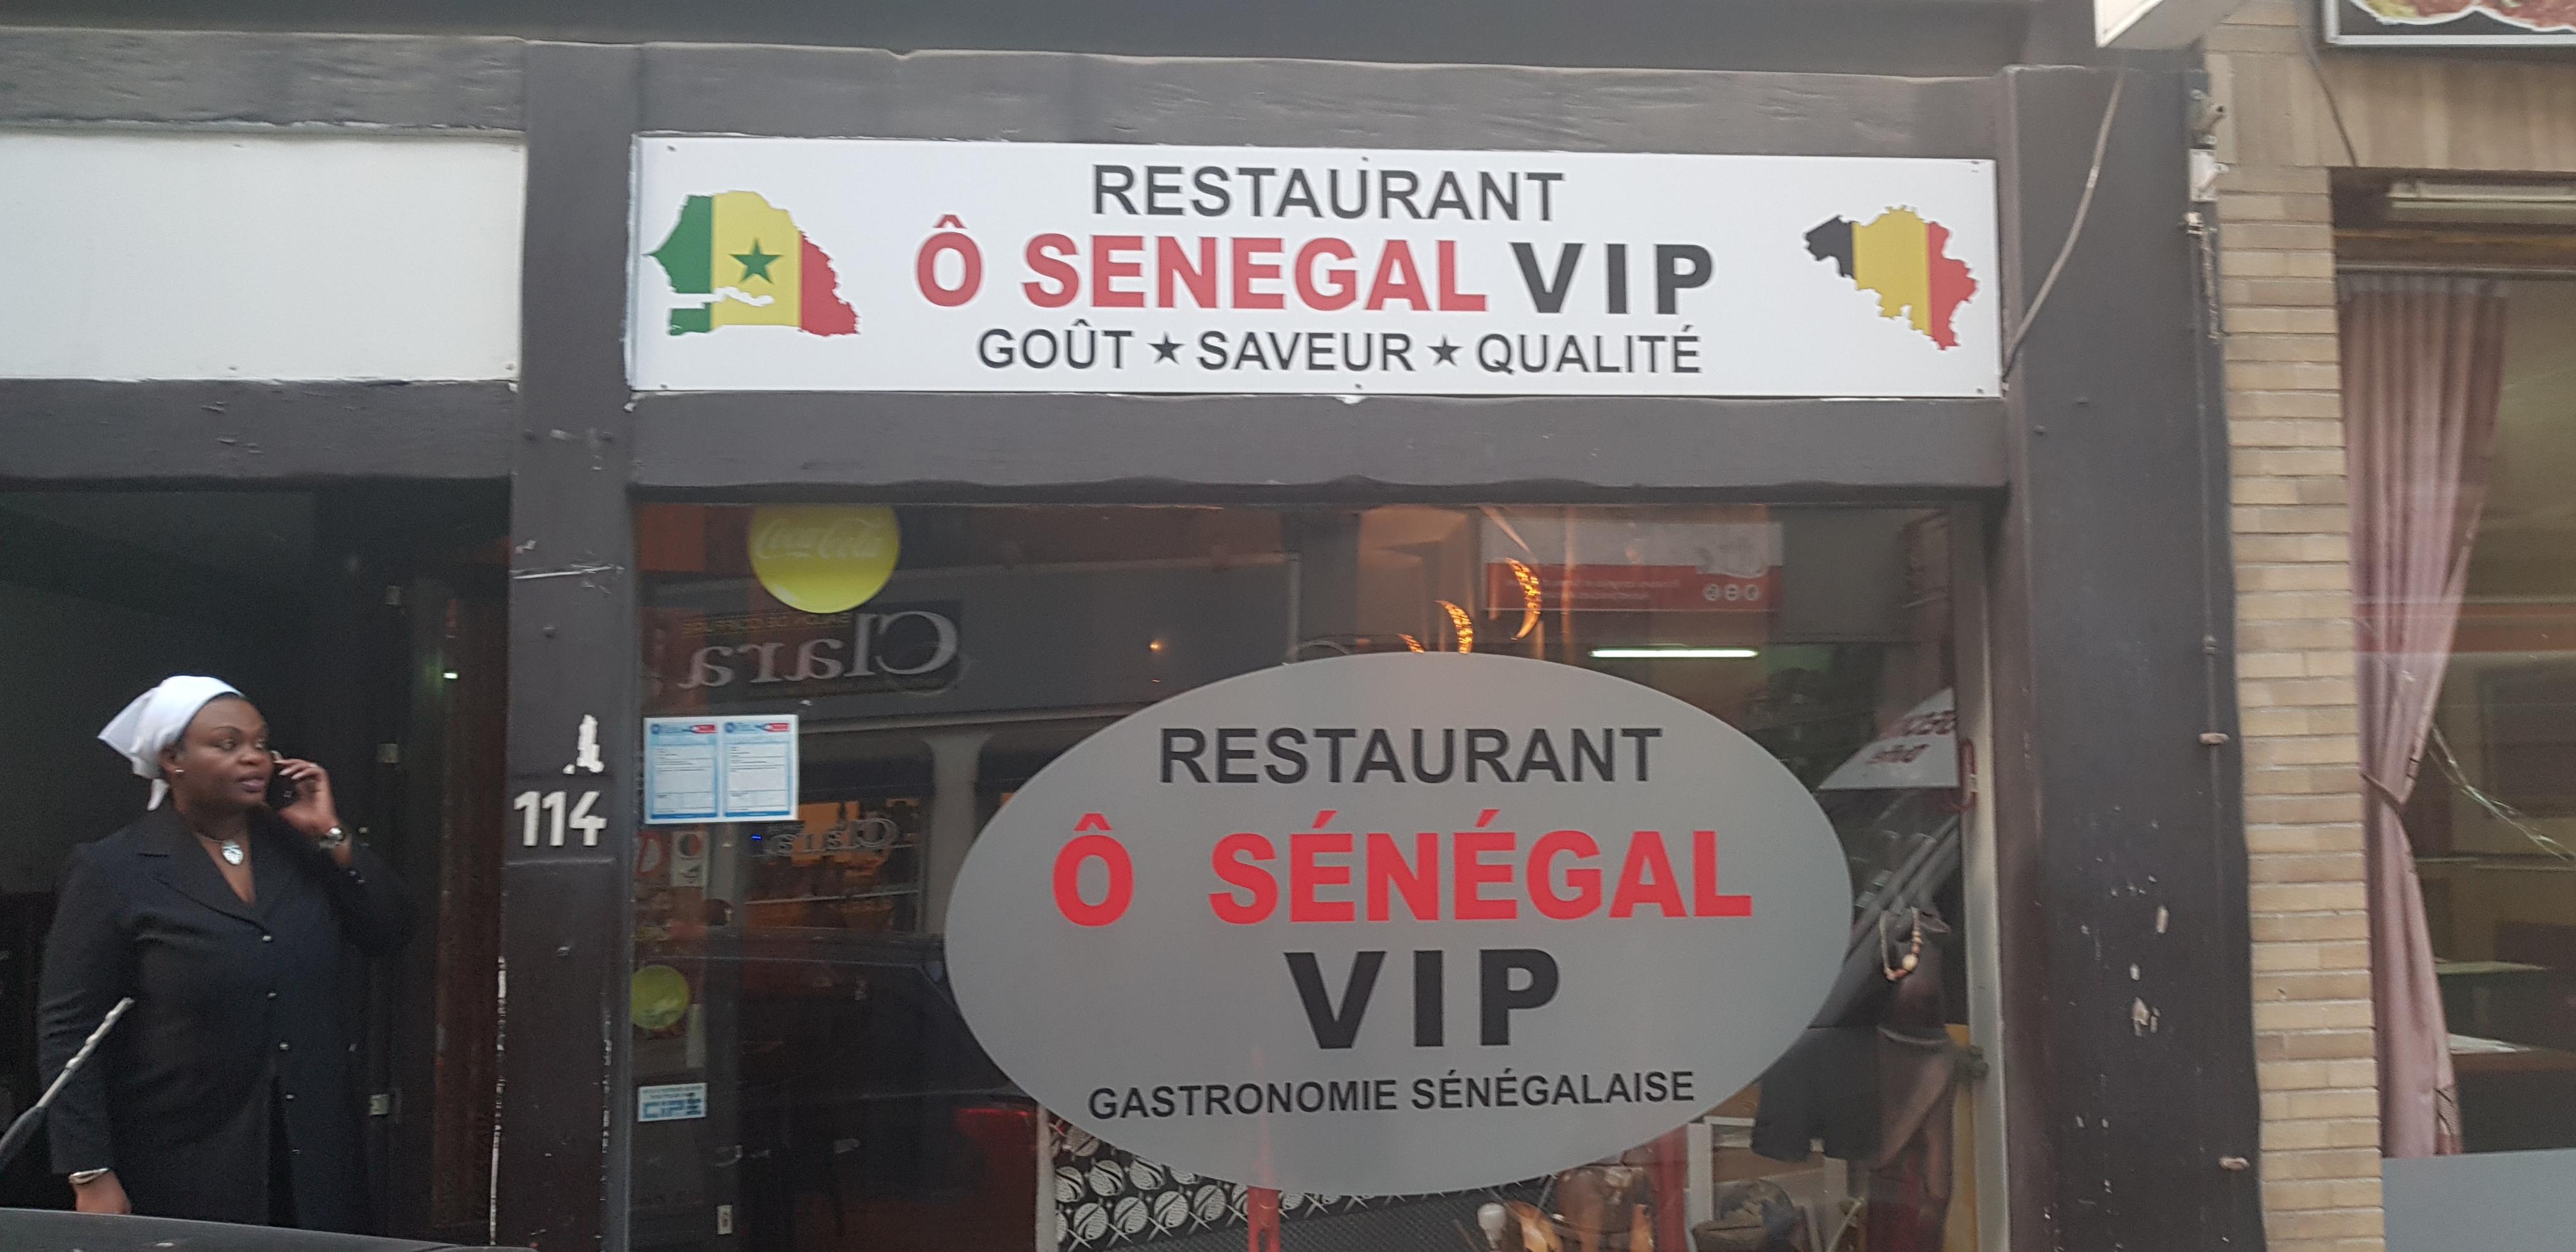 O VIP SENEGAL VOTRE RESTAURANT CHIC A BRUXELLES CHEZ YATTA. PUB